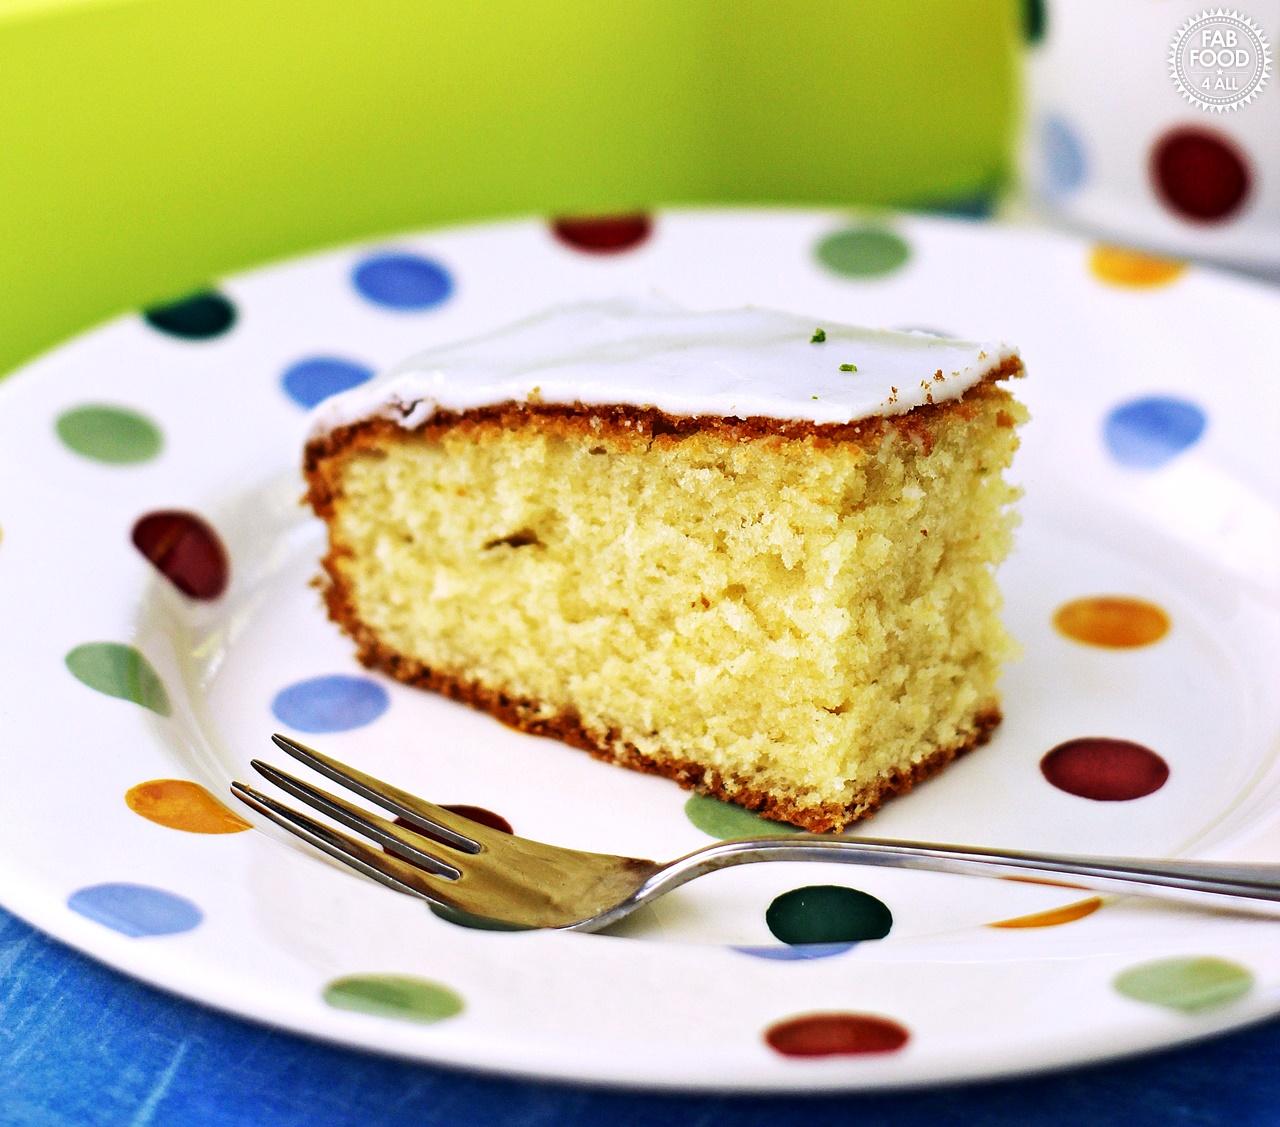 Slice of Iced Lime Cake